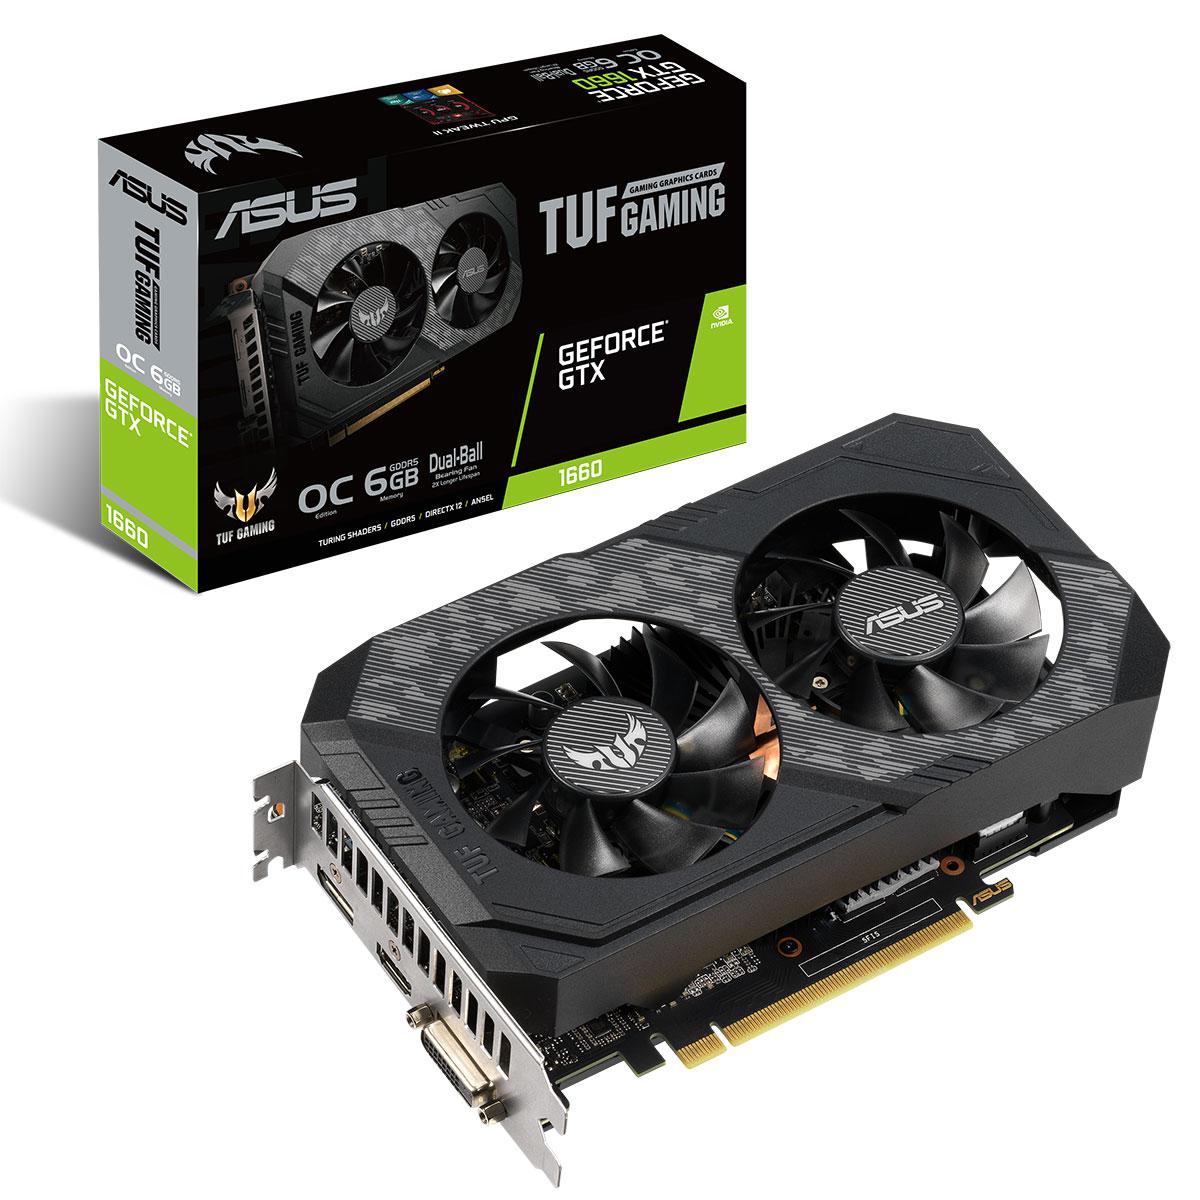 Carte graphique ASUS GeForce GTX 1660 TUF-GTX1660-O6G 6 Go GDDR5 - HDMI/DisplayPort/DVI - PCI Express (NVIDIA GeForce GTX 1660)